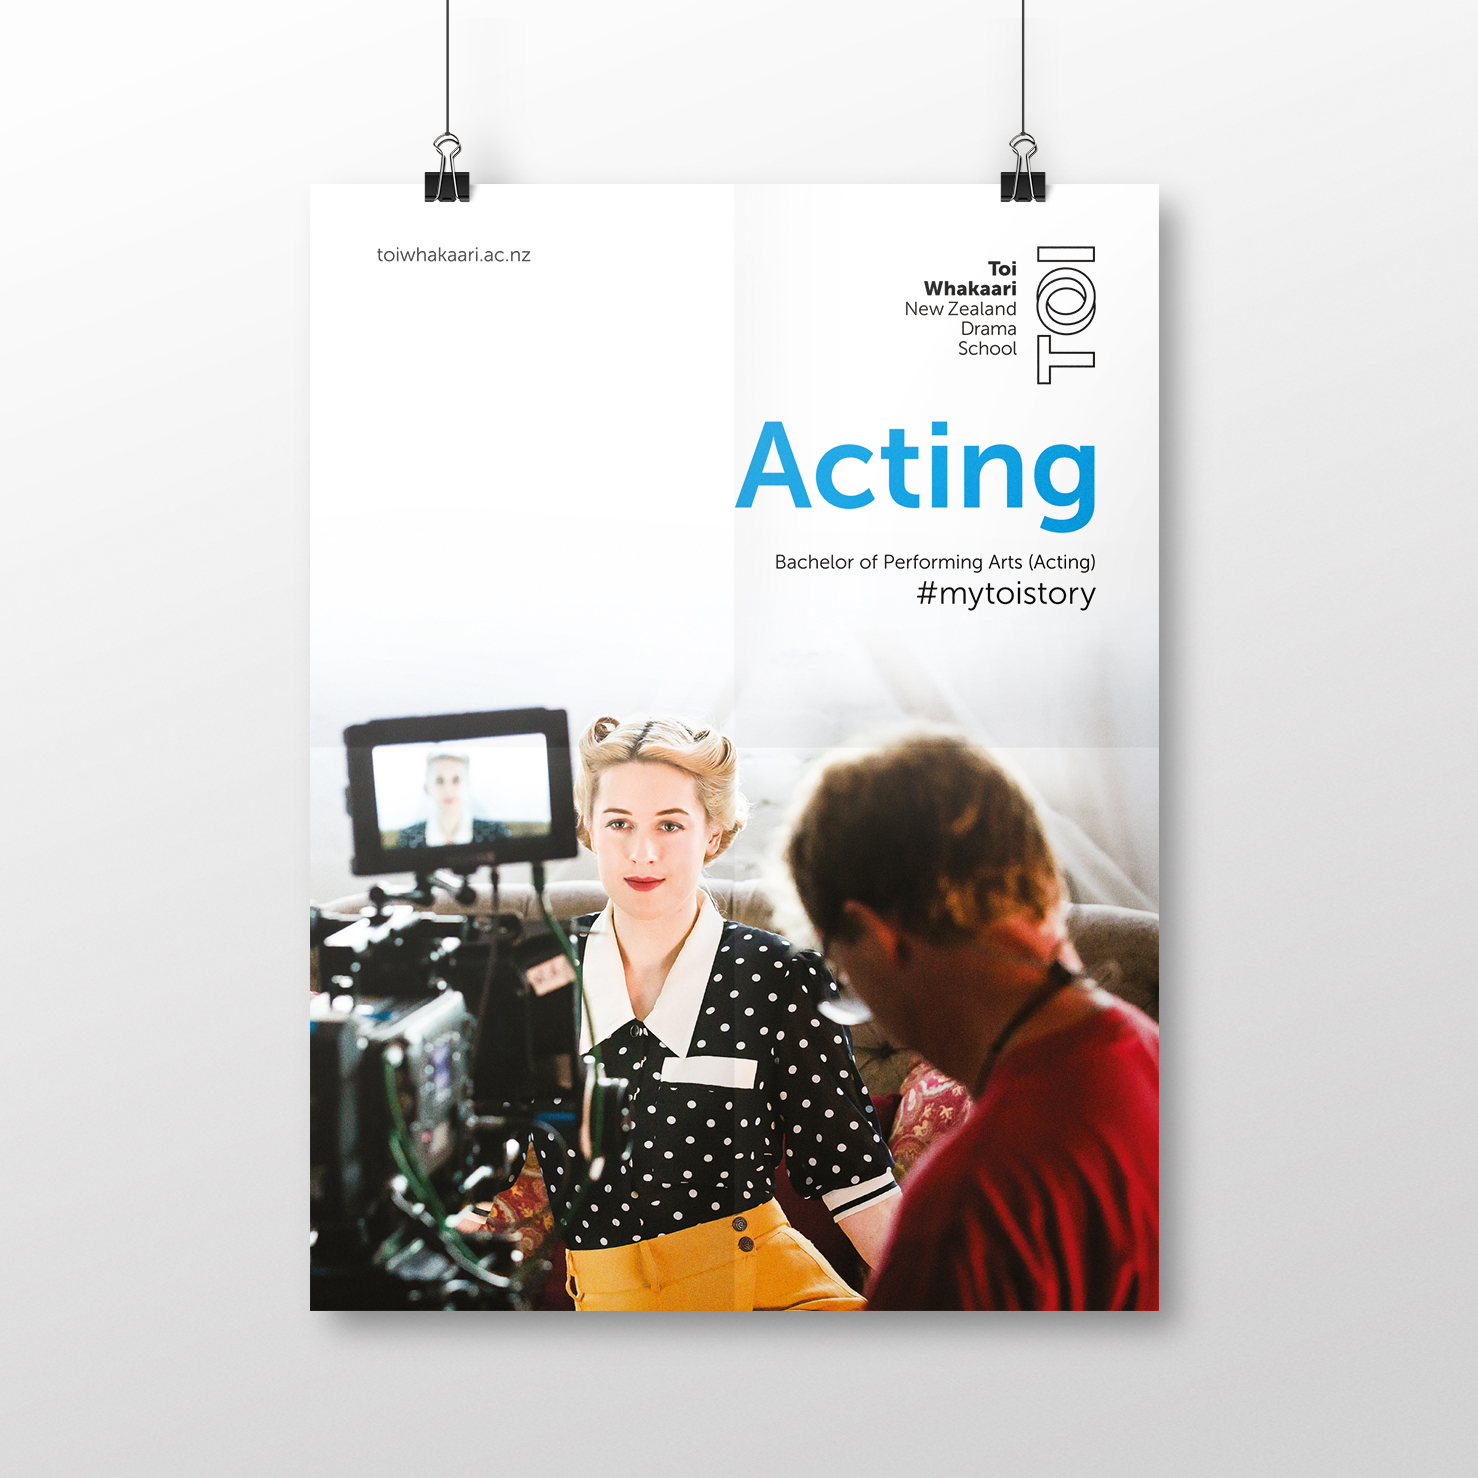 Toi-Poster Acting-1.jpg